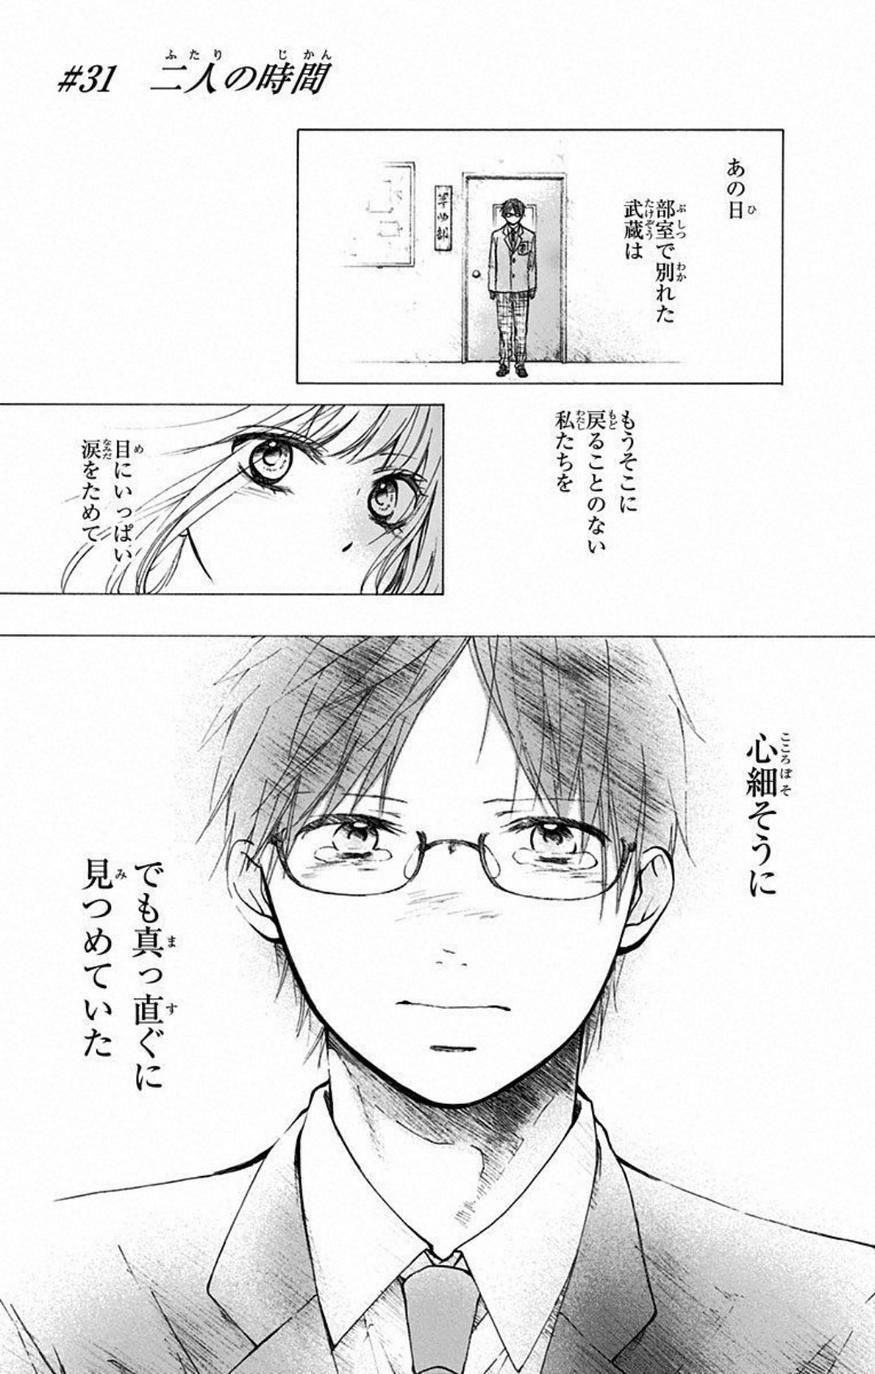 Kono Oto Tomare! - Chapter 31 - Page 1